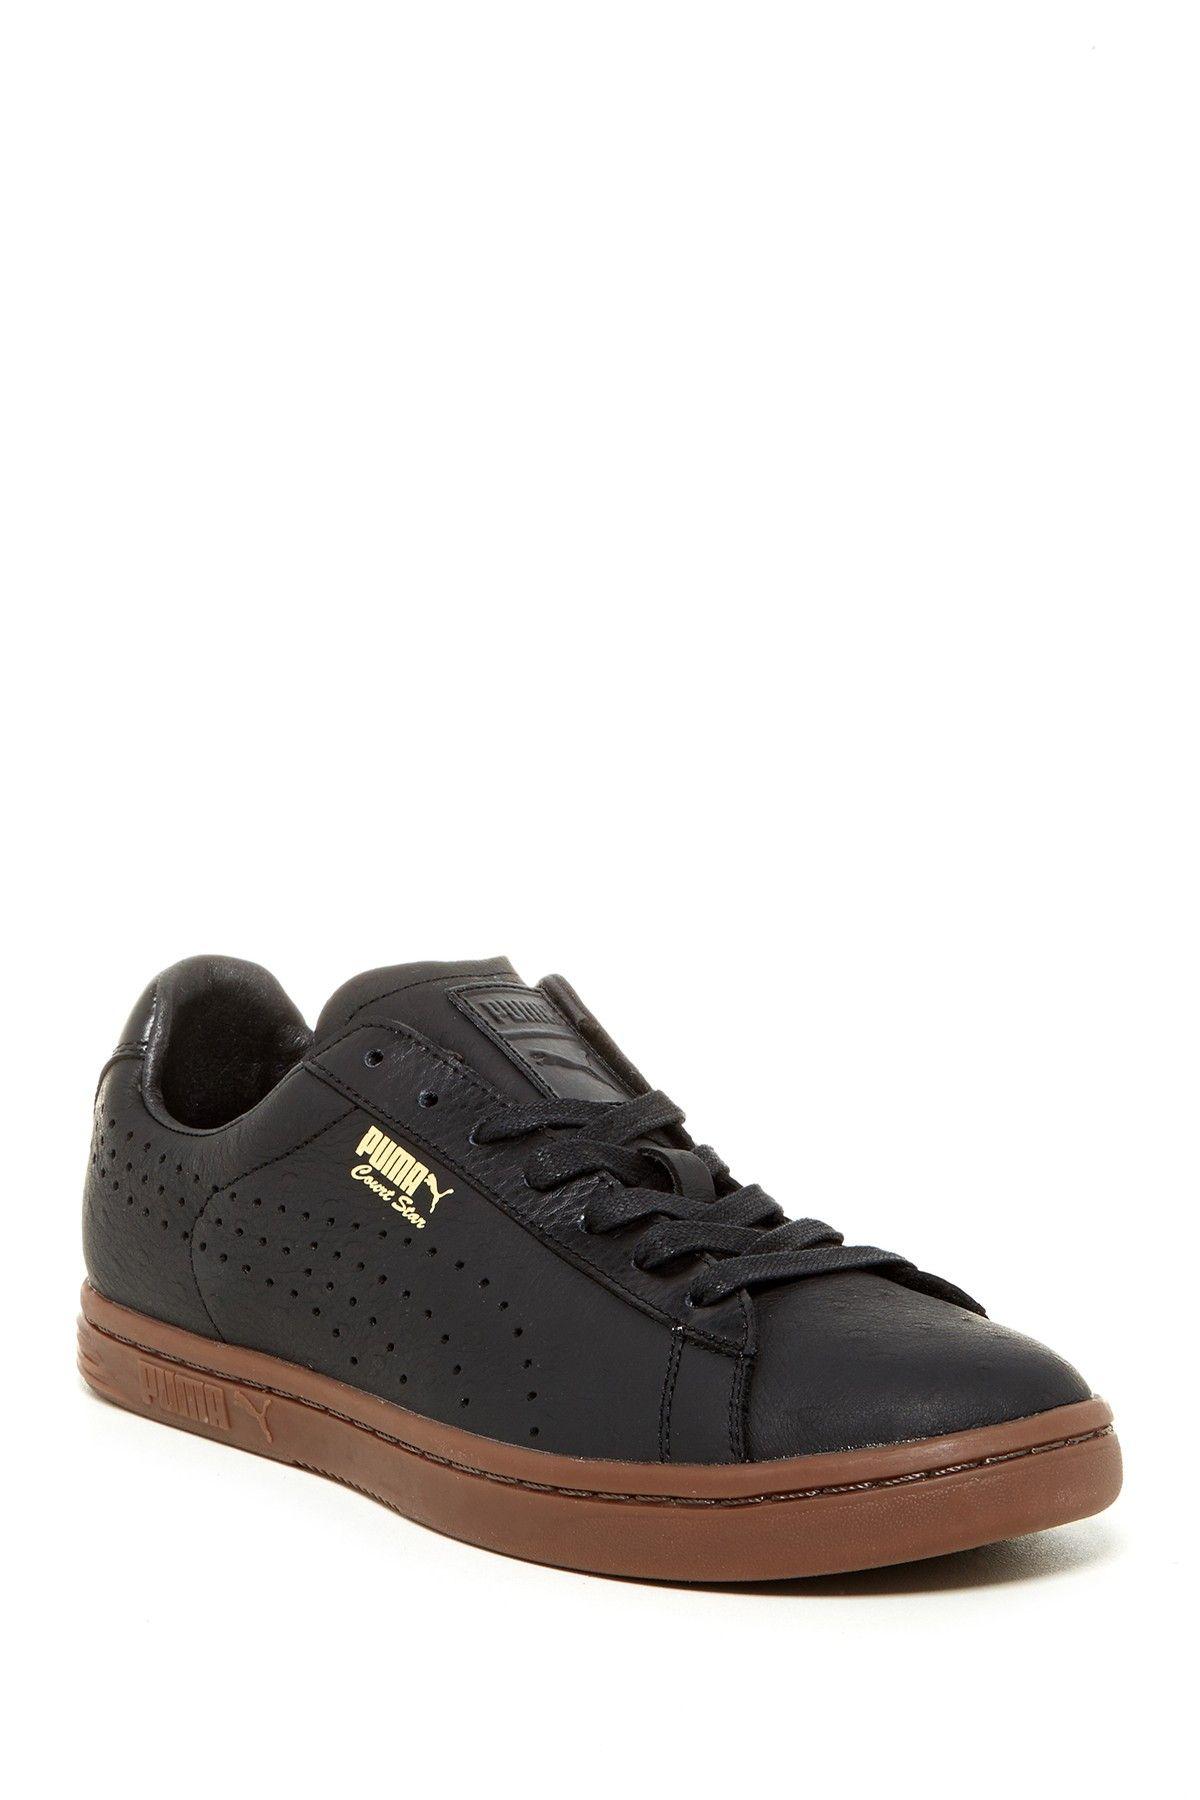 timeless design fb286 71a6a Puma Court Star: Black/Gum   Sneakers: Puma Court Star ...